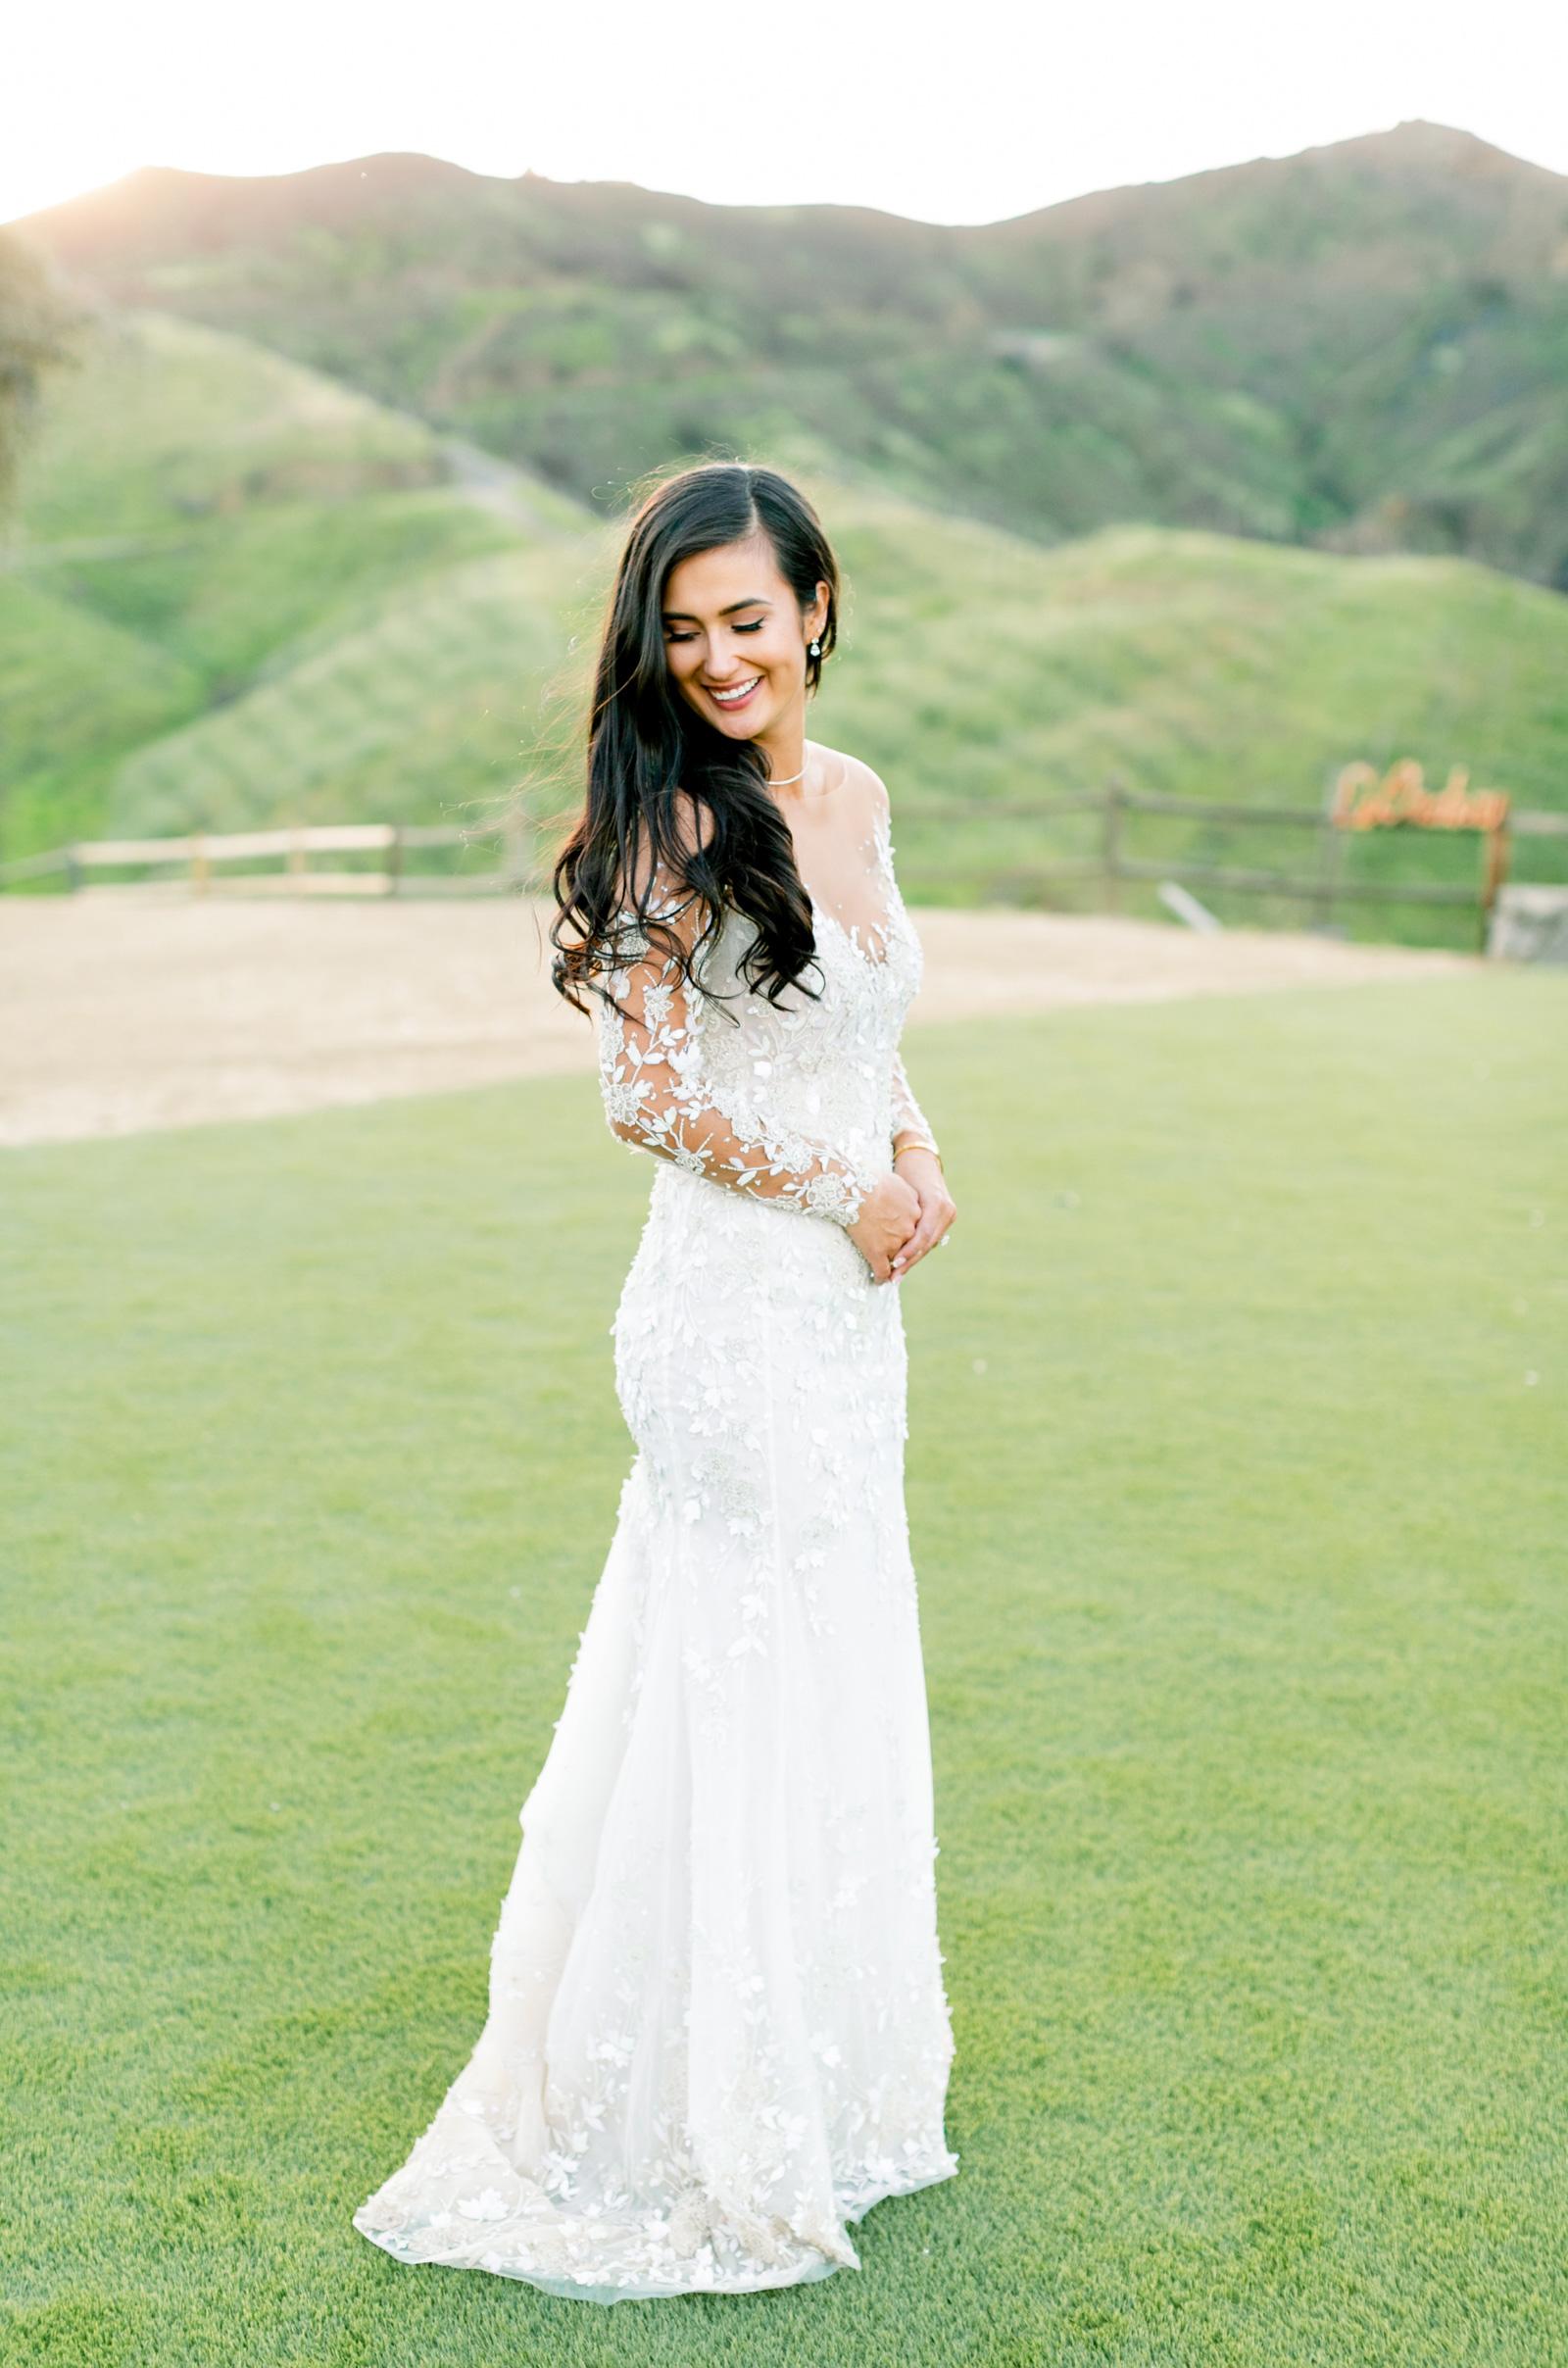 Malibu-Wedding-Photographer-Southern-California-Wedding-Venues-Malibu-Wedding-Photographer-Natalie-Schutt-Photography_10.jpg